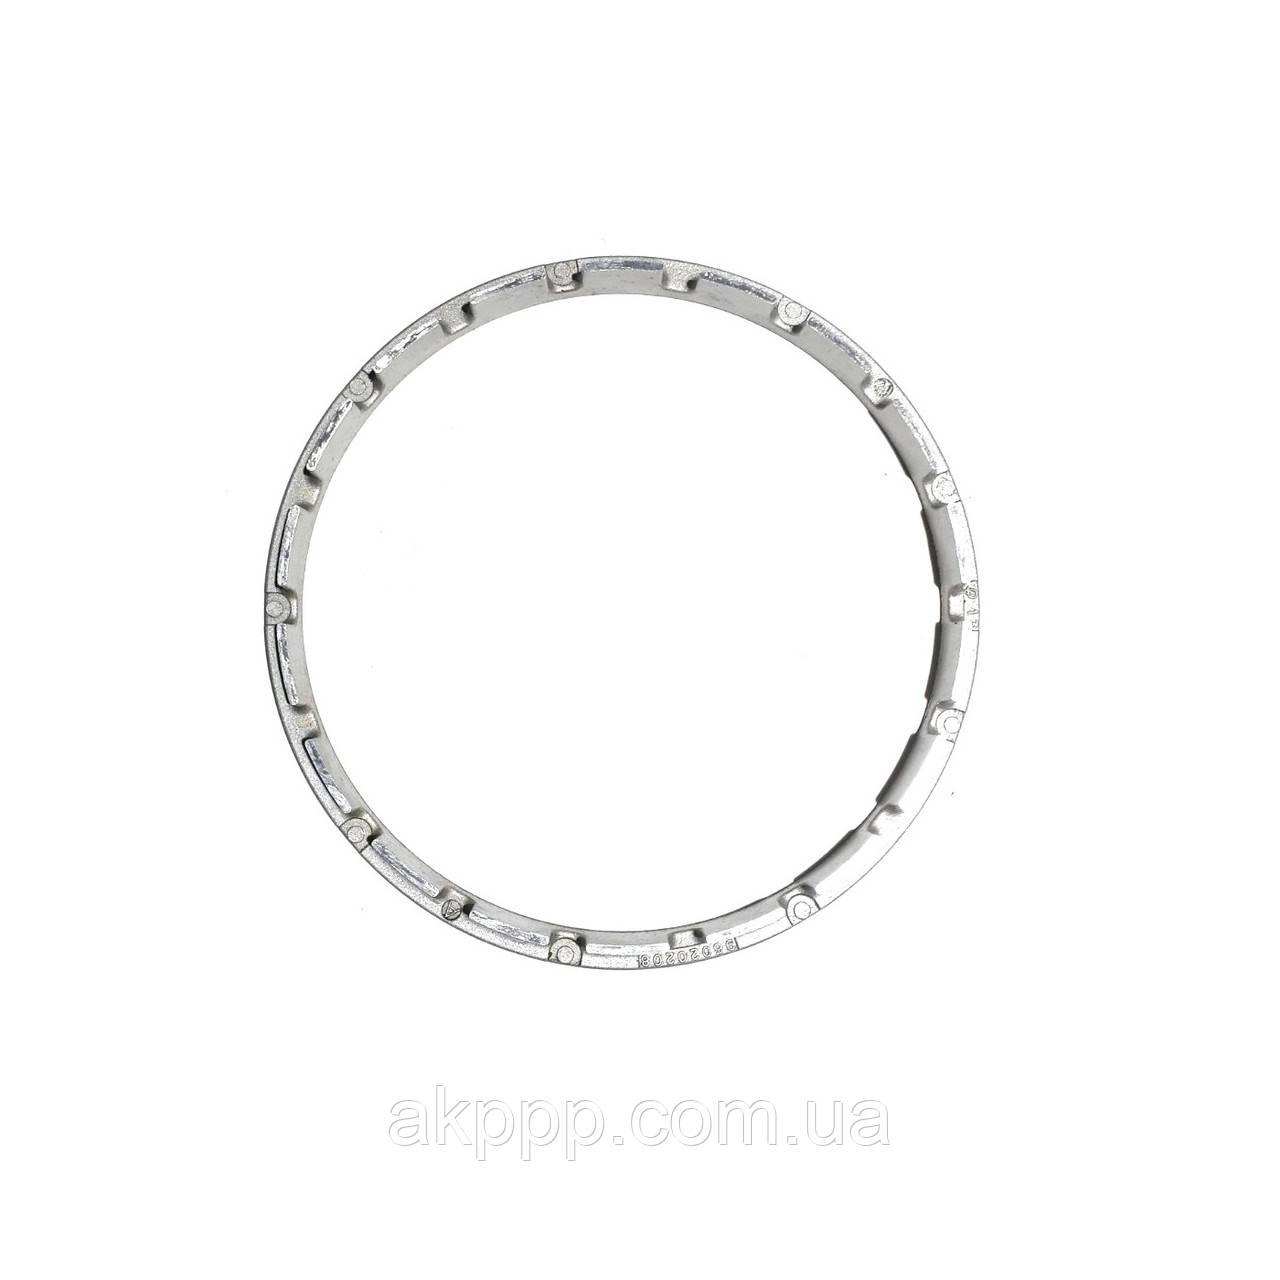 Опорное кольцо пакета Overdrive акпп 5L40E б/у